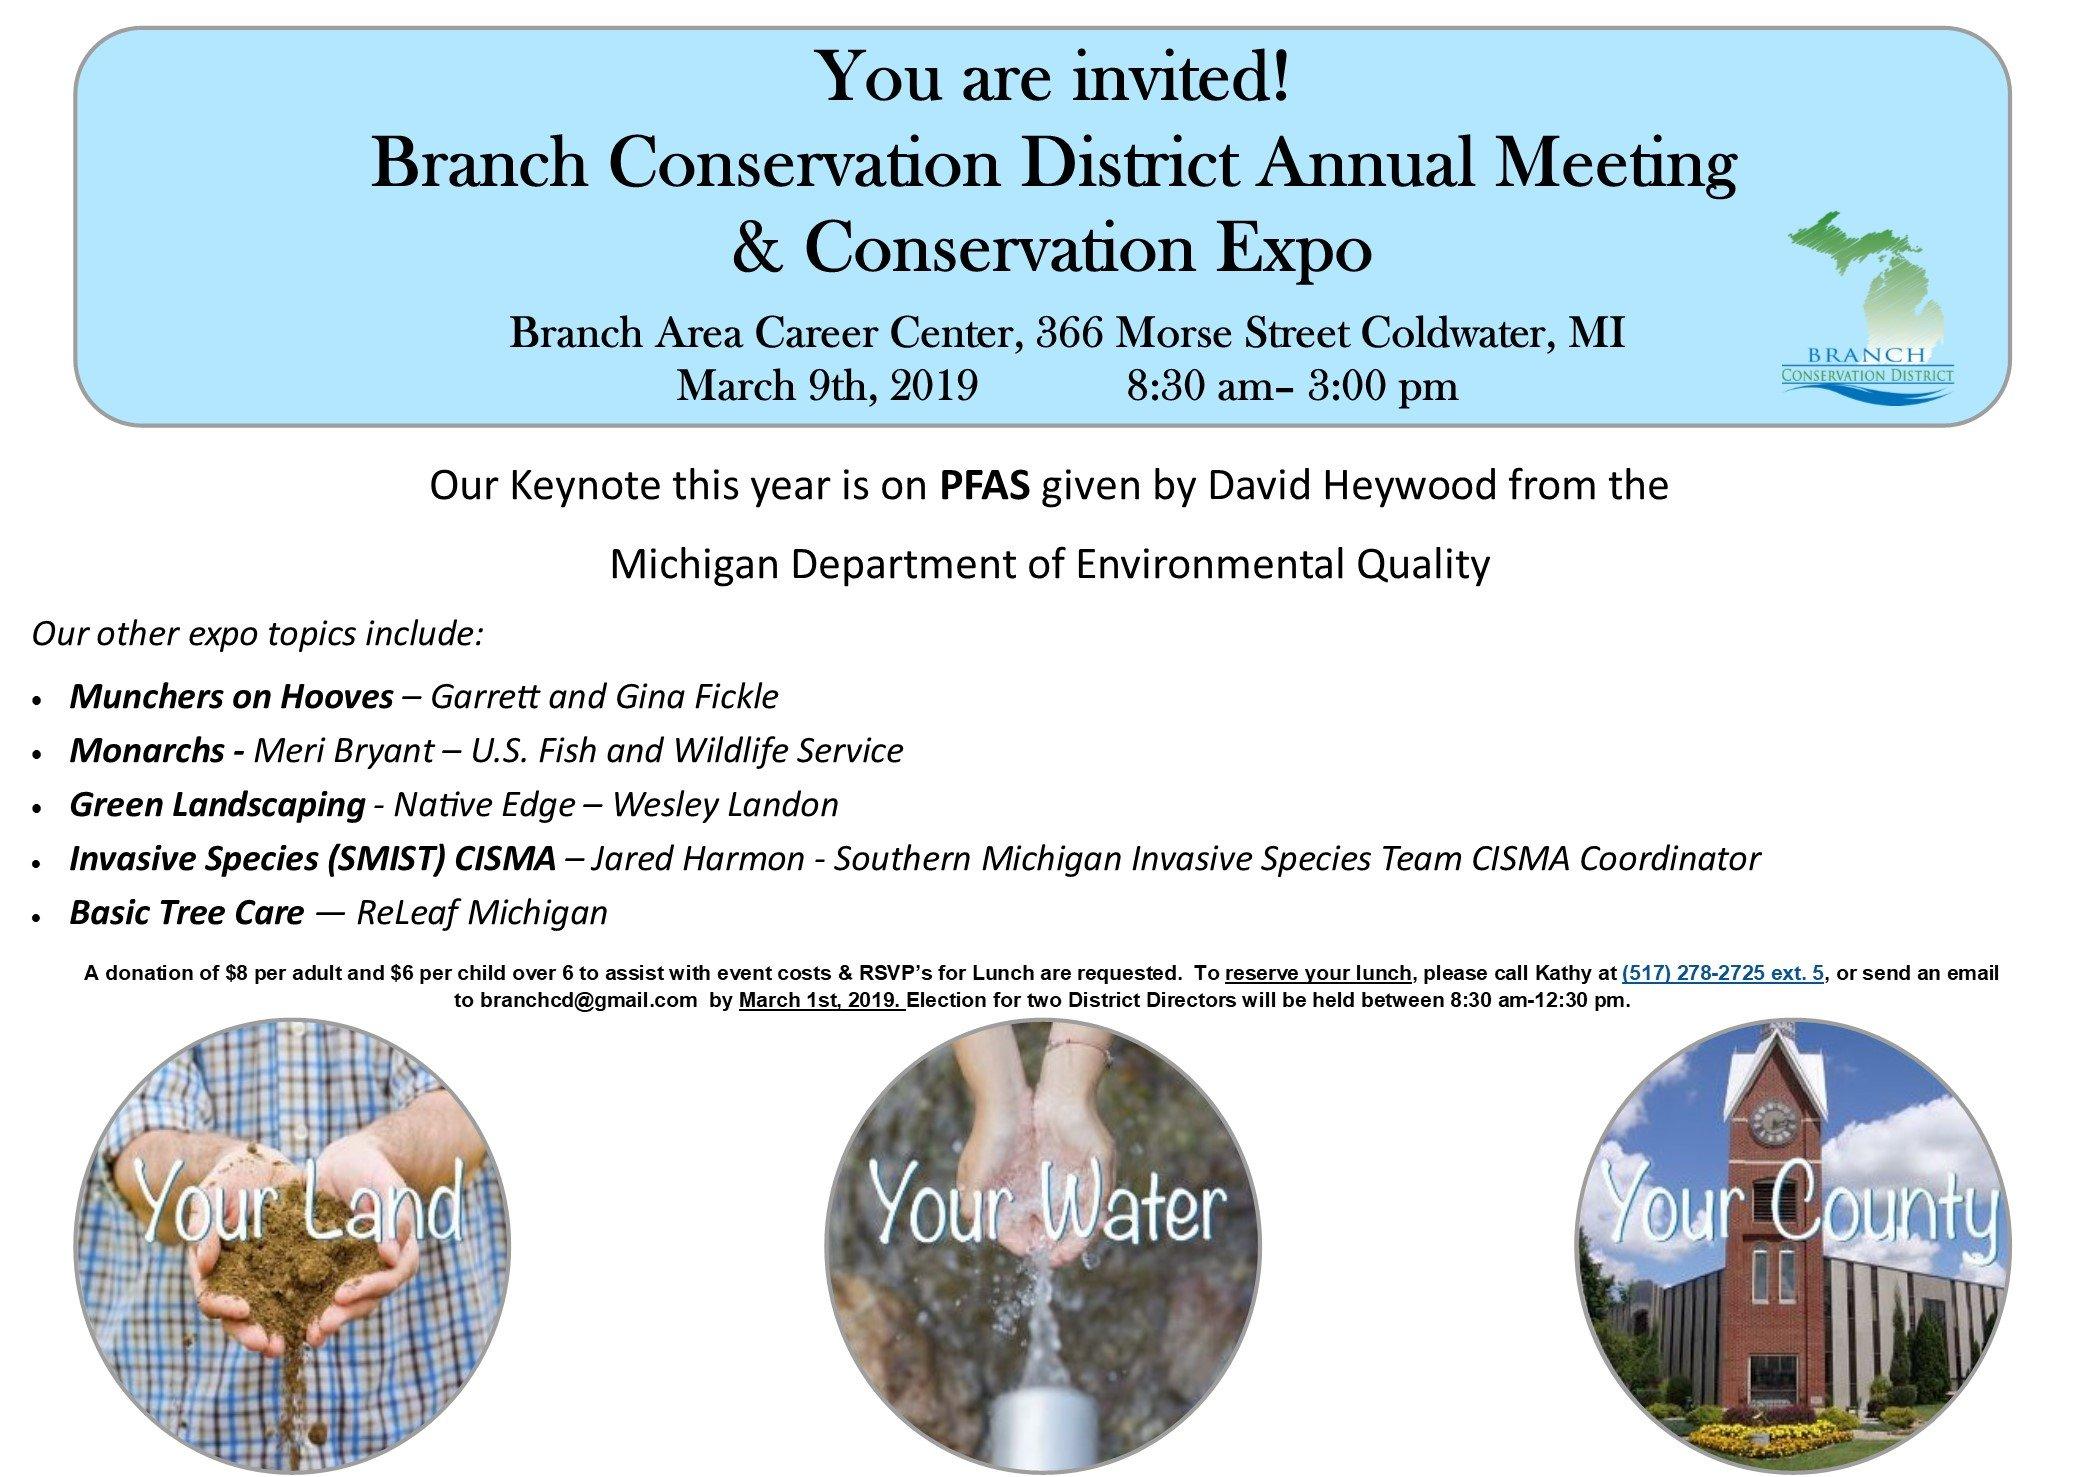 BCCD 71 Annual Meeting